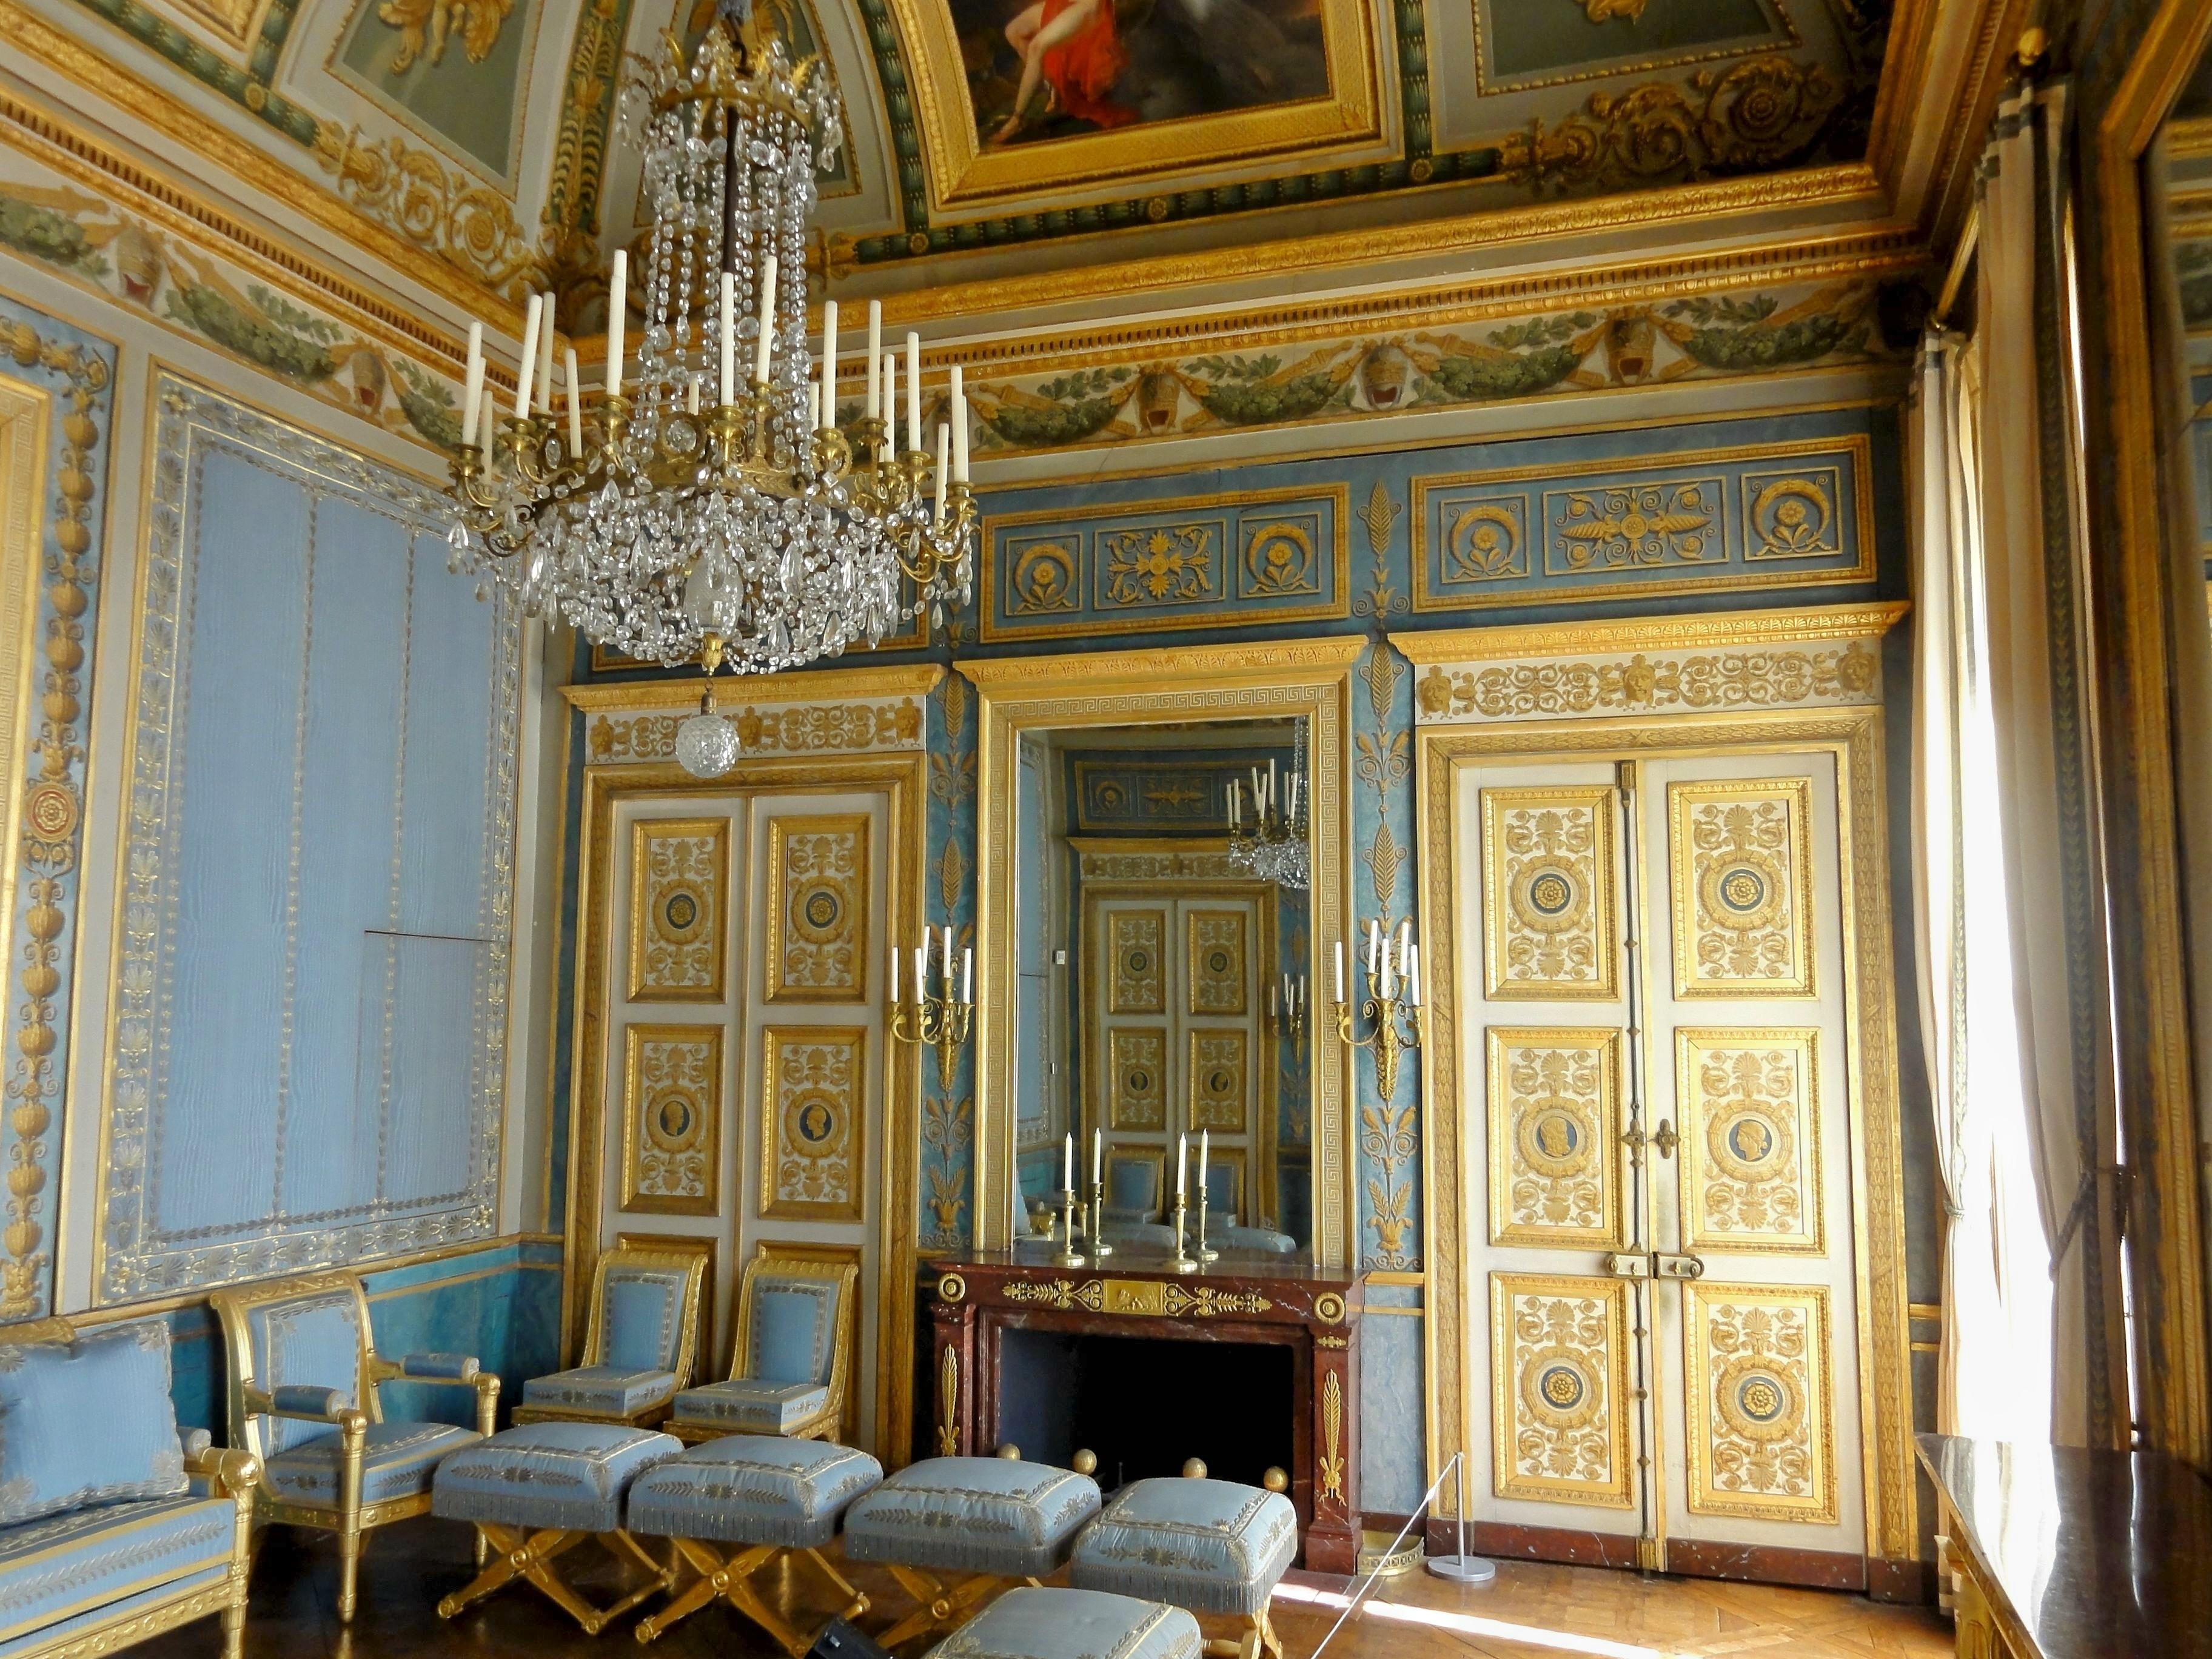 FileCompigne 60 Palais Salon Bleu 3jpg Wikimedia